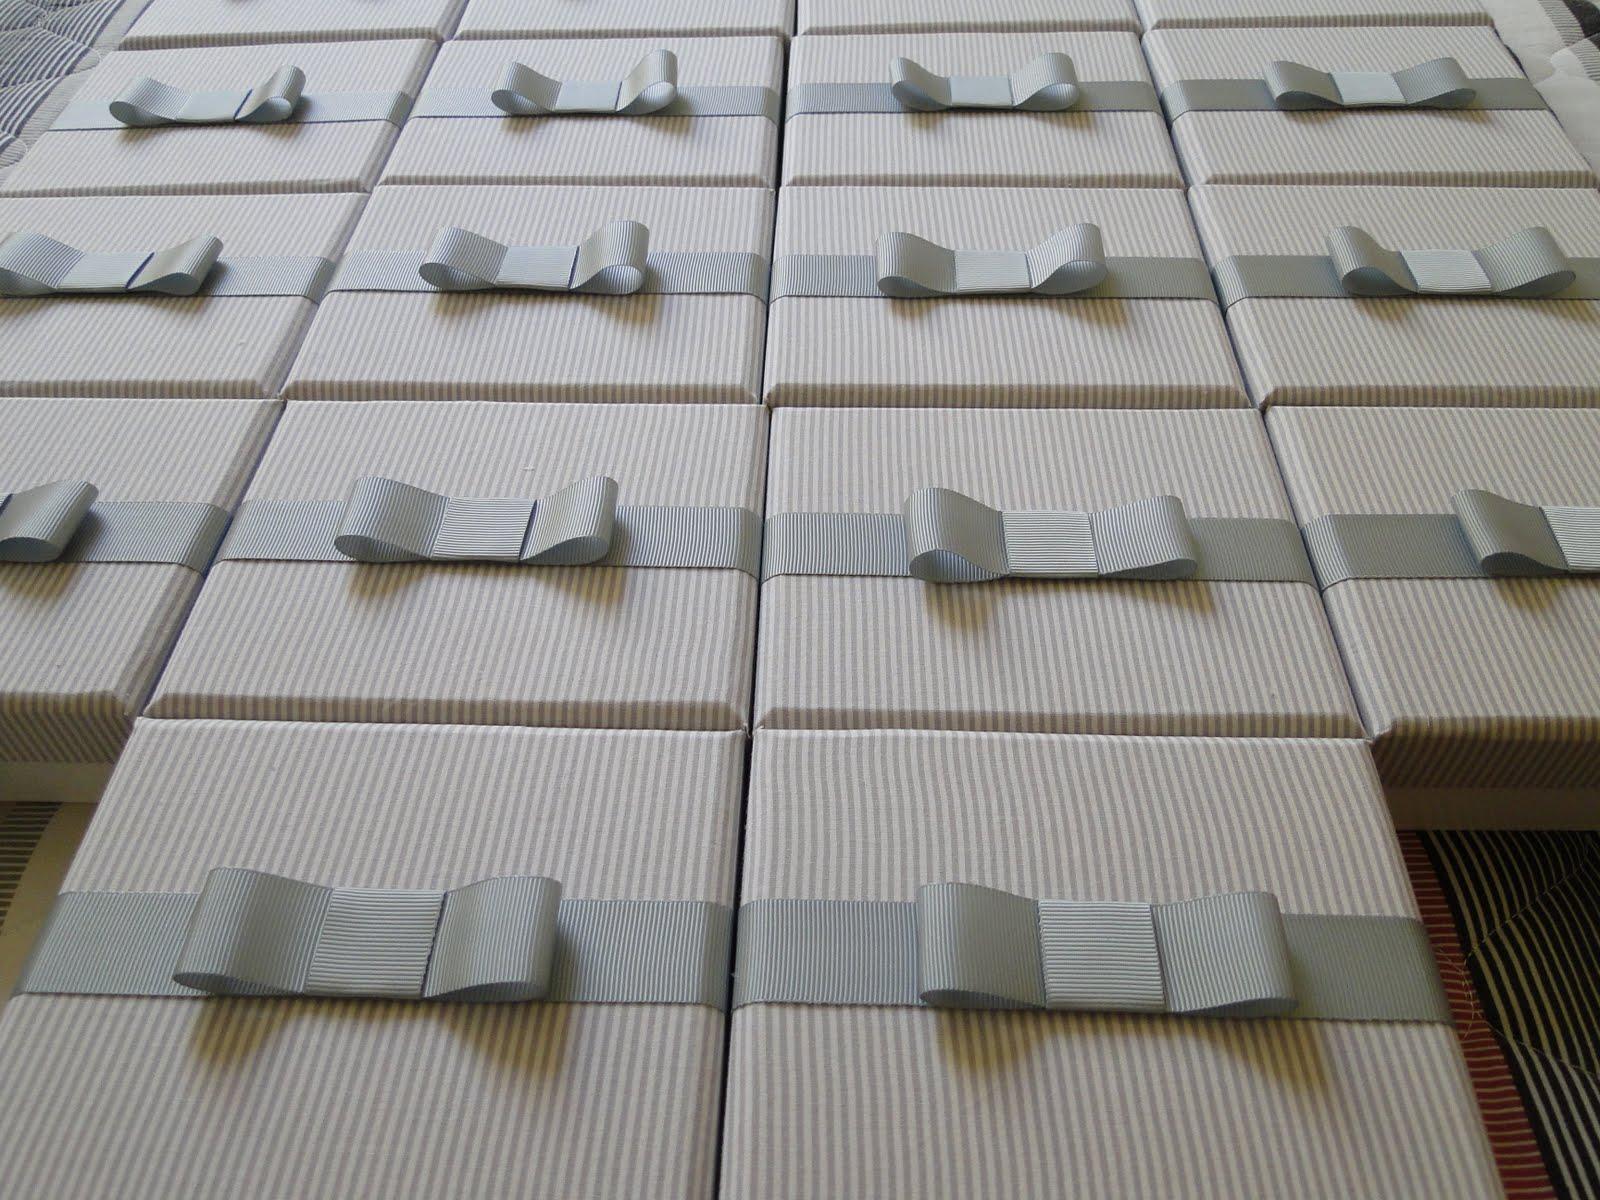 Oficina das caixas festa branco e prata for Oficina de caixa